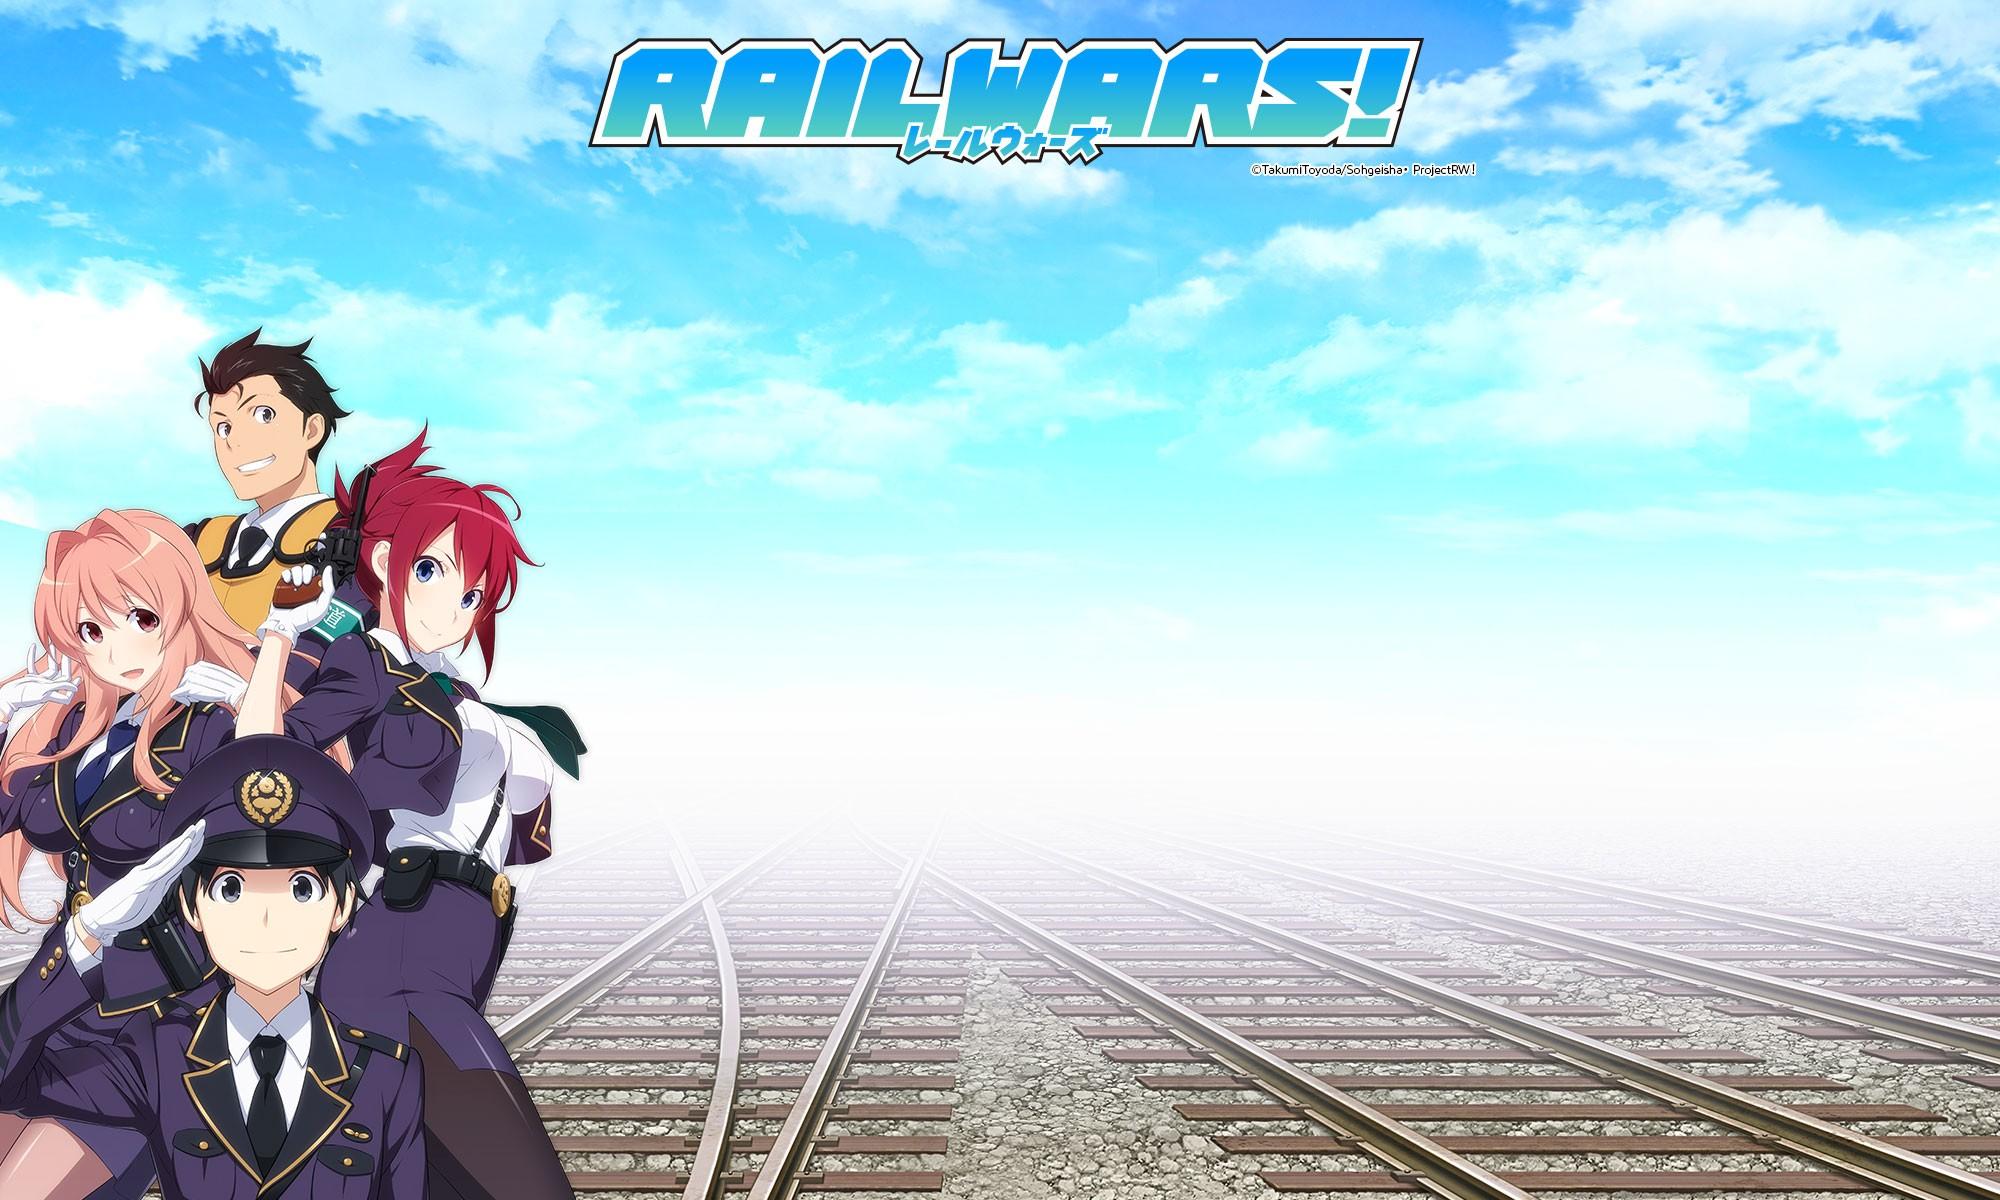 Anime 2000x1200 Rail Wars anime Koumi Haruka Sakurai Aoi Iwaizumi Shou anime boys anime girls cyan boobs pink hair railway redhead looking at viewer two women big boobs tie long hair